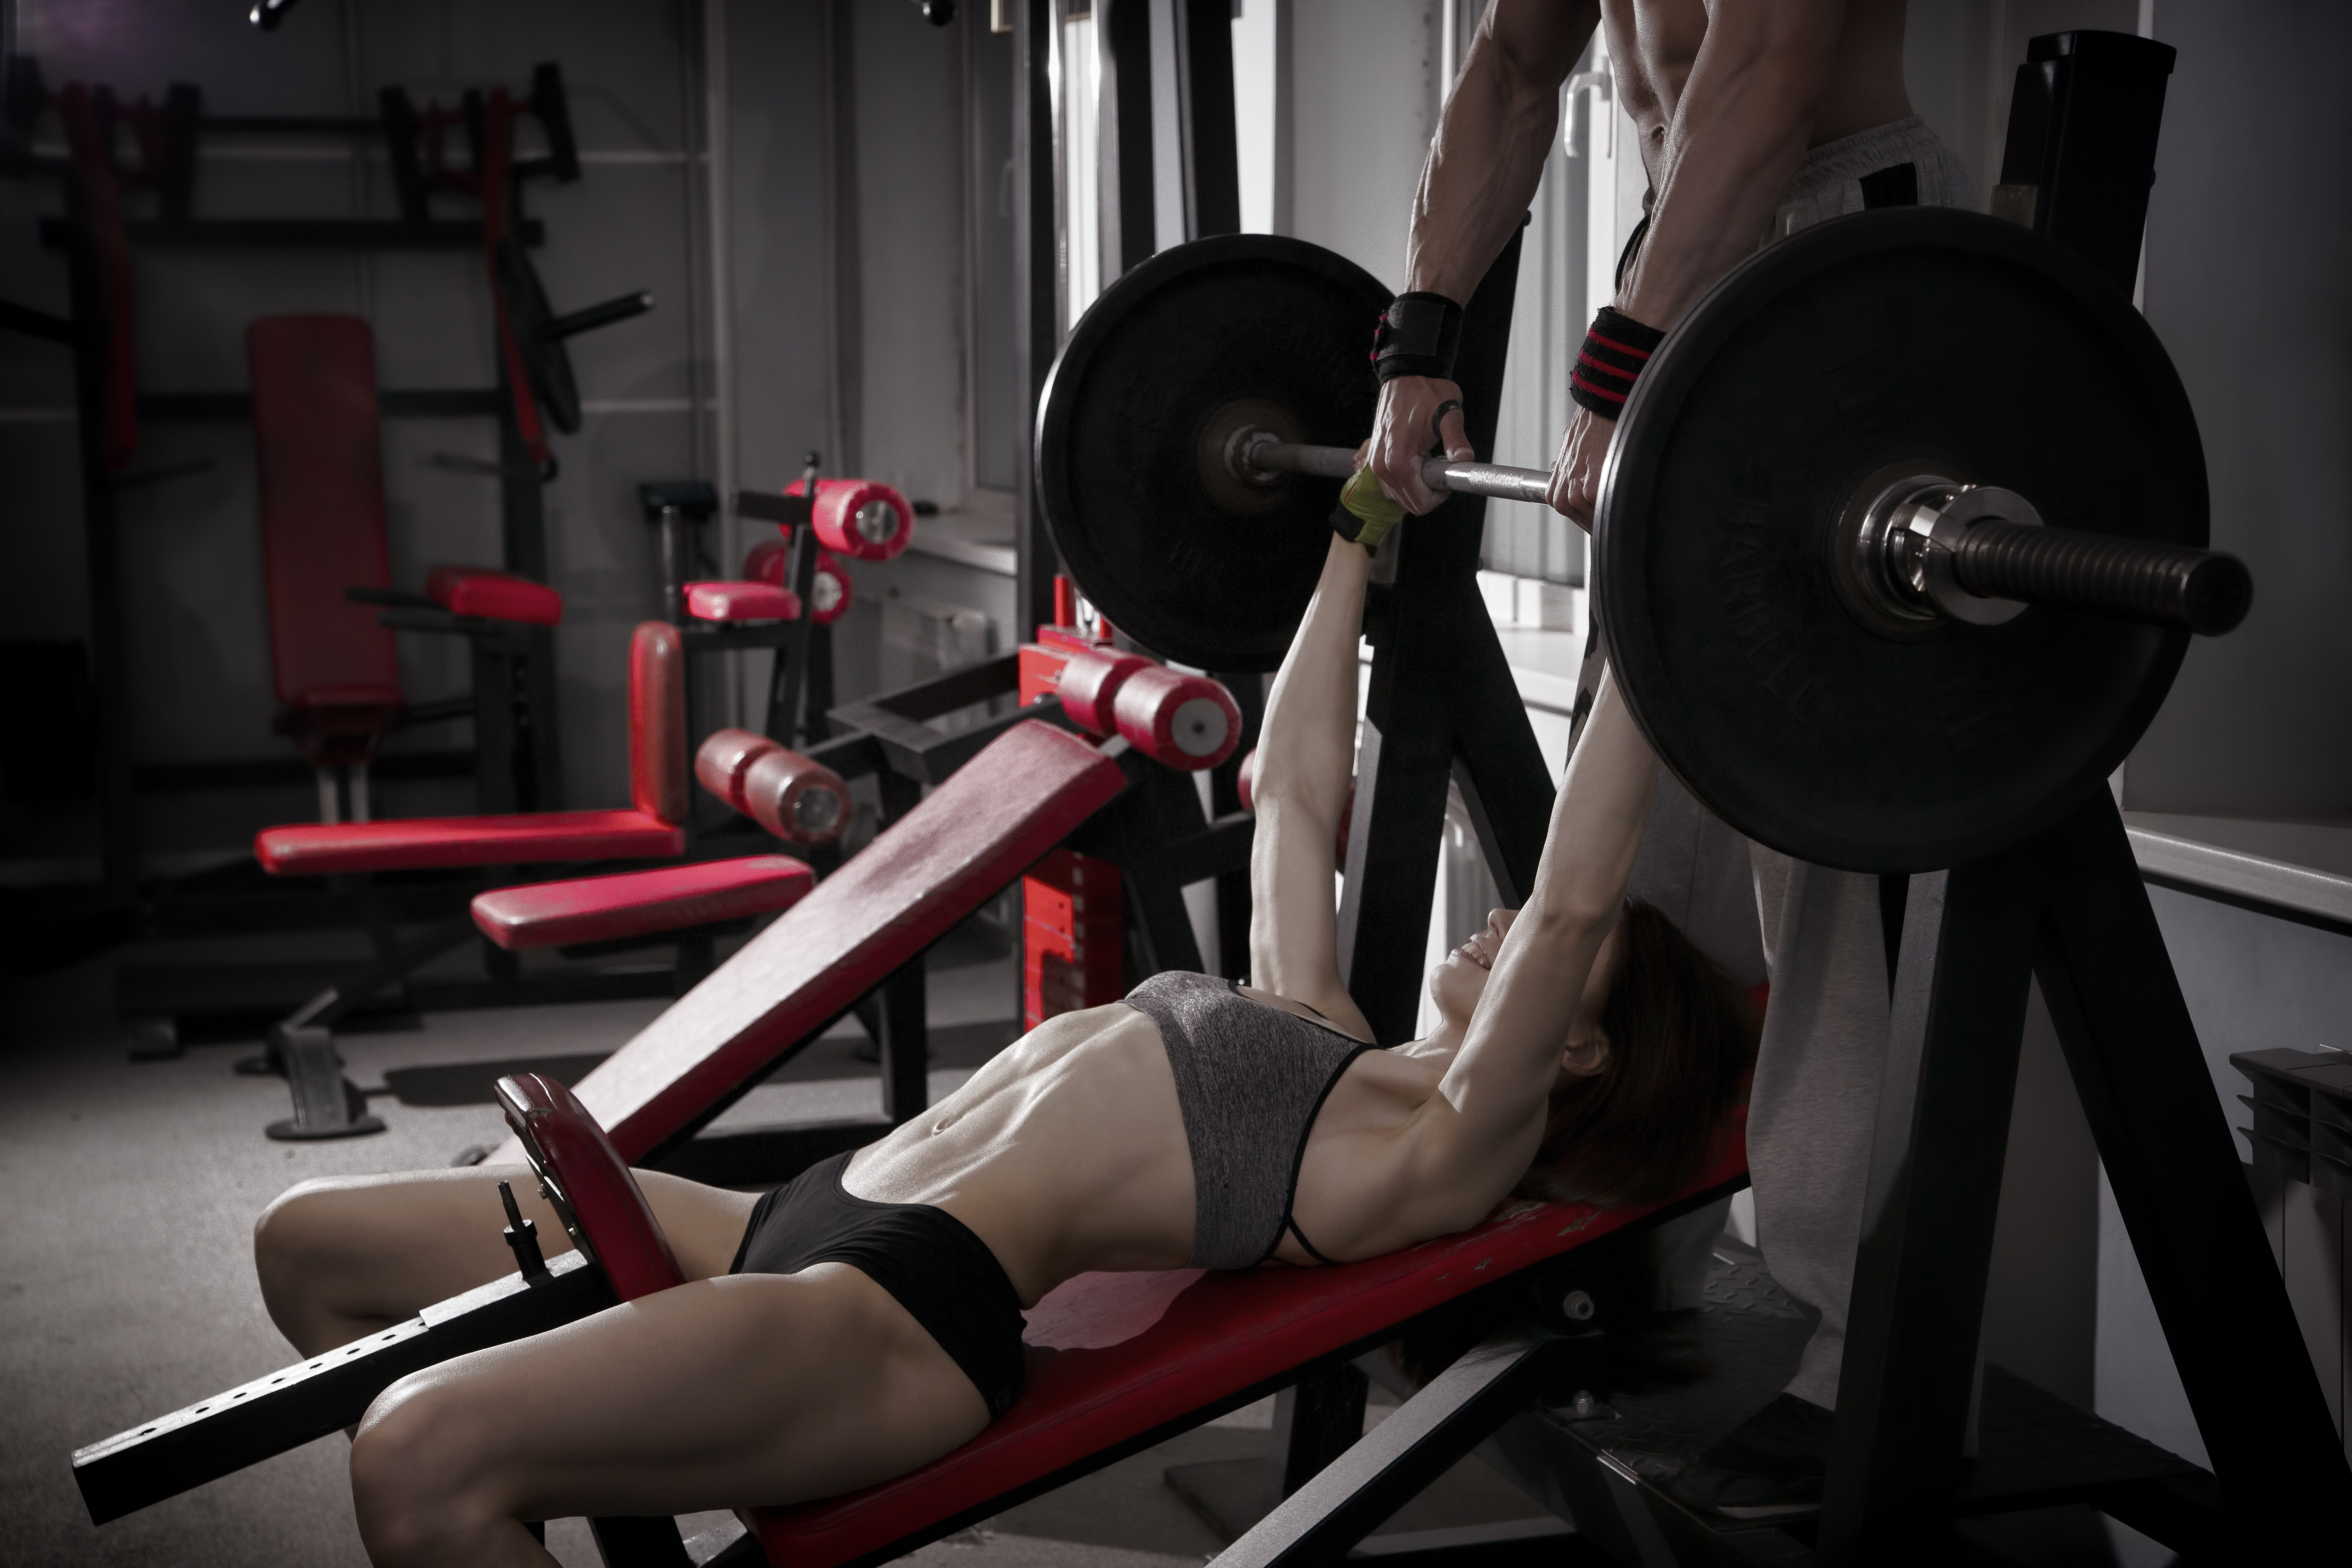 Картинка: Девушка, мужчина, поддержка, спортзал, штанга, жим лёжа, улыбка, фигура, тренажёры